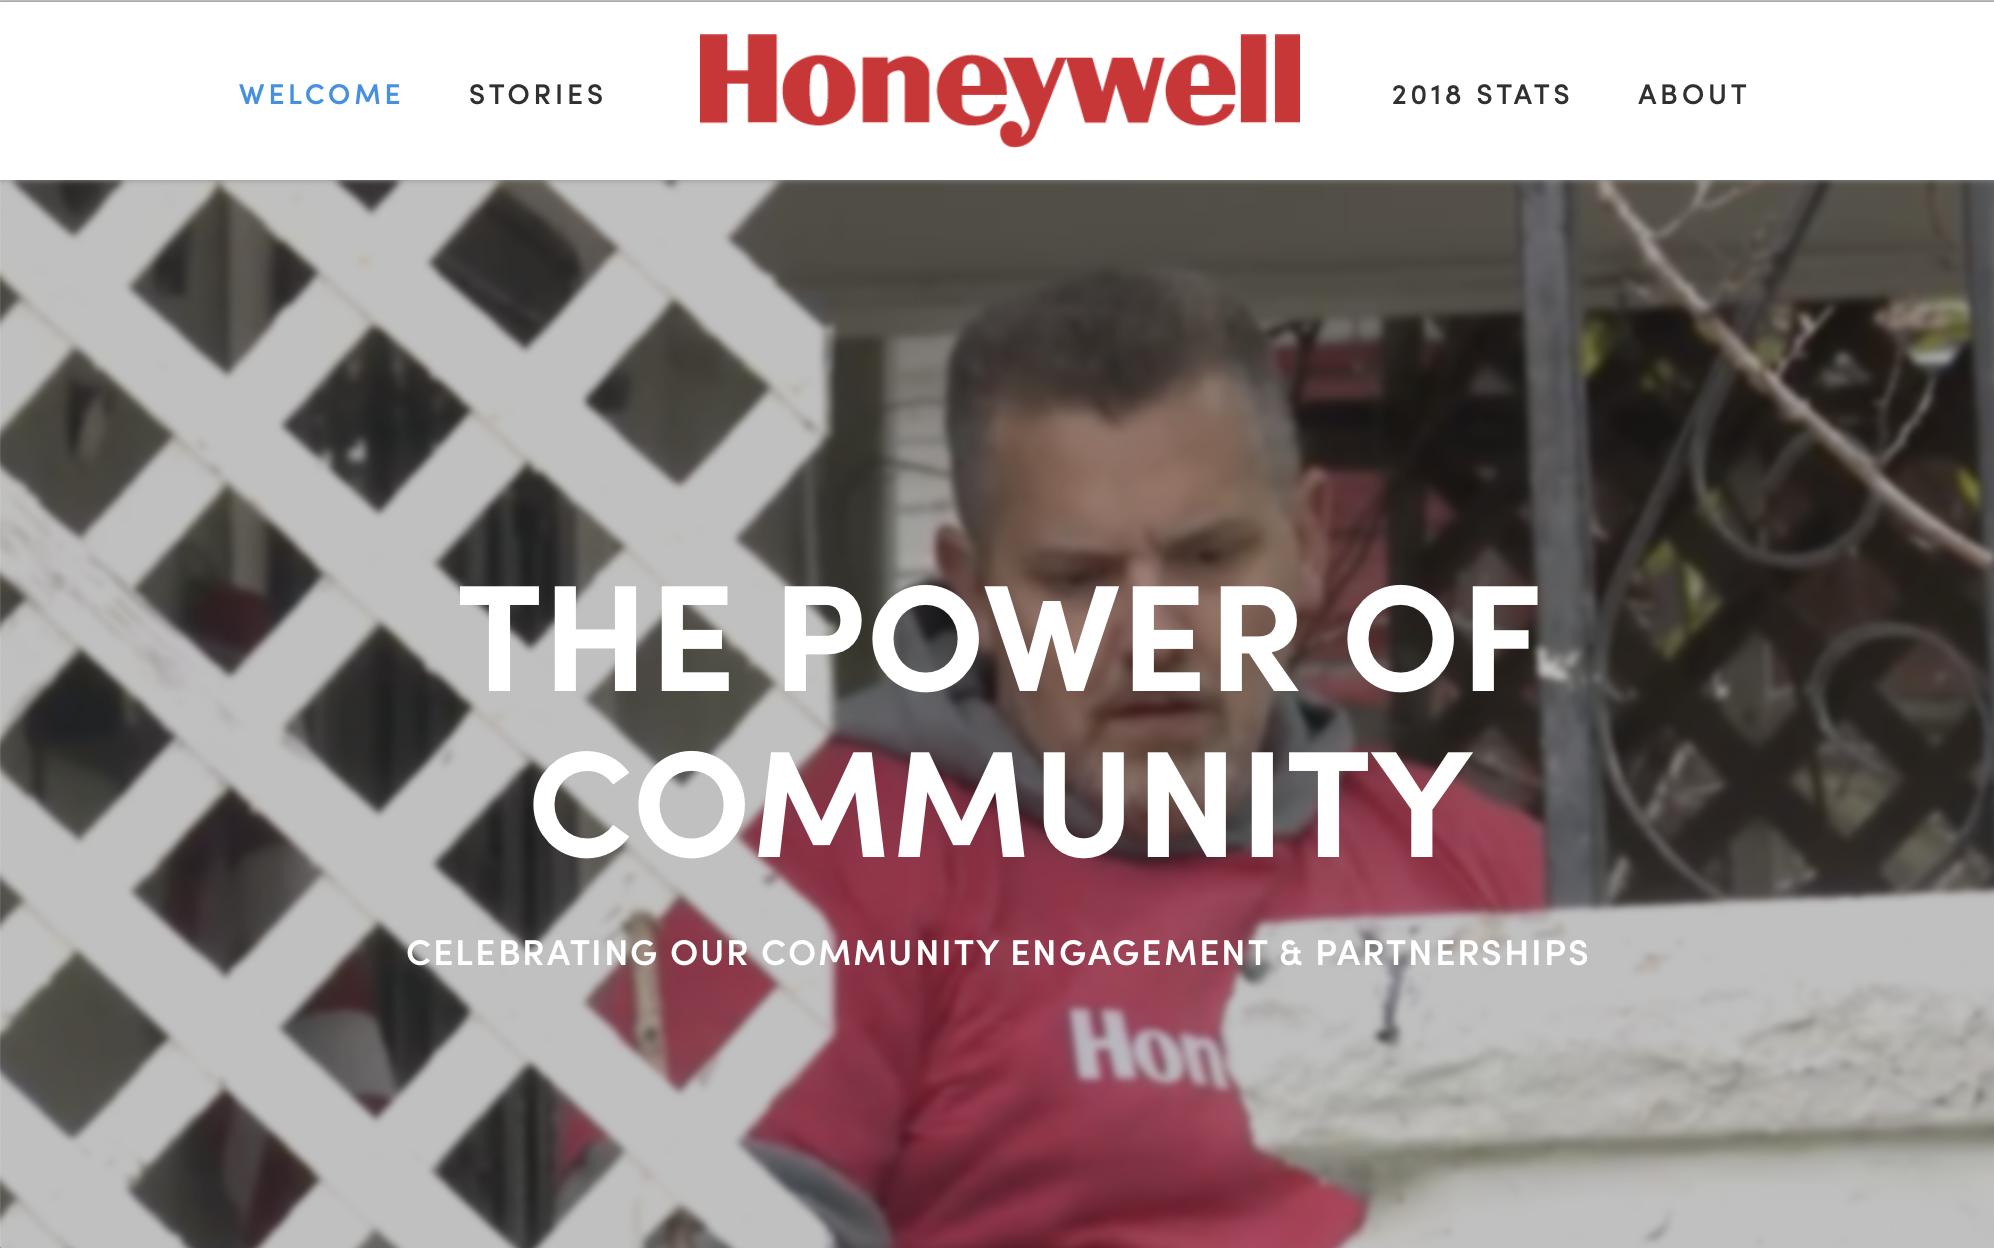 Honeywell - The Power of Community